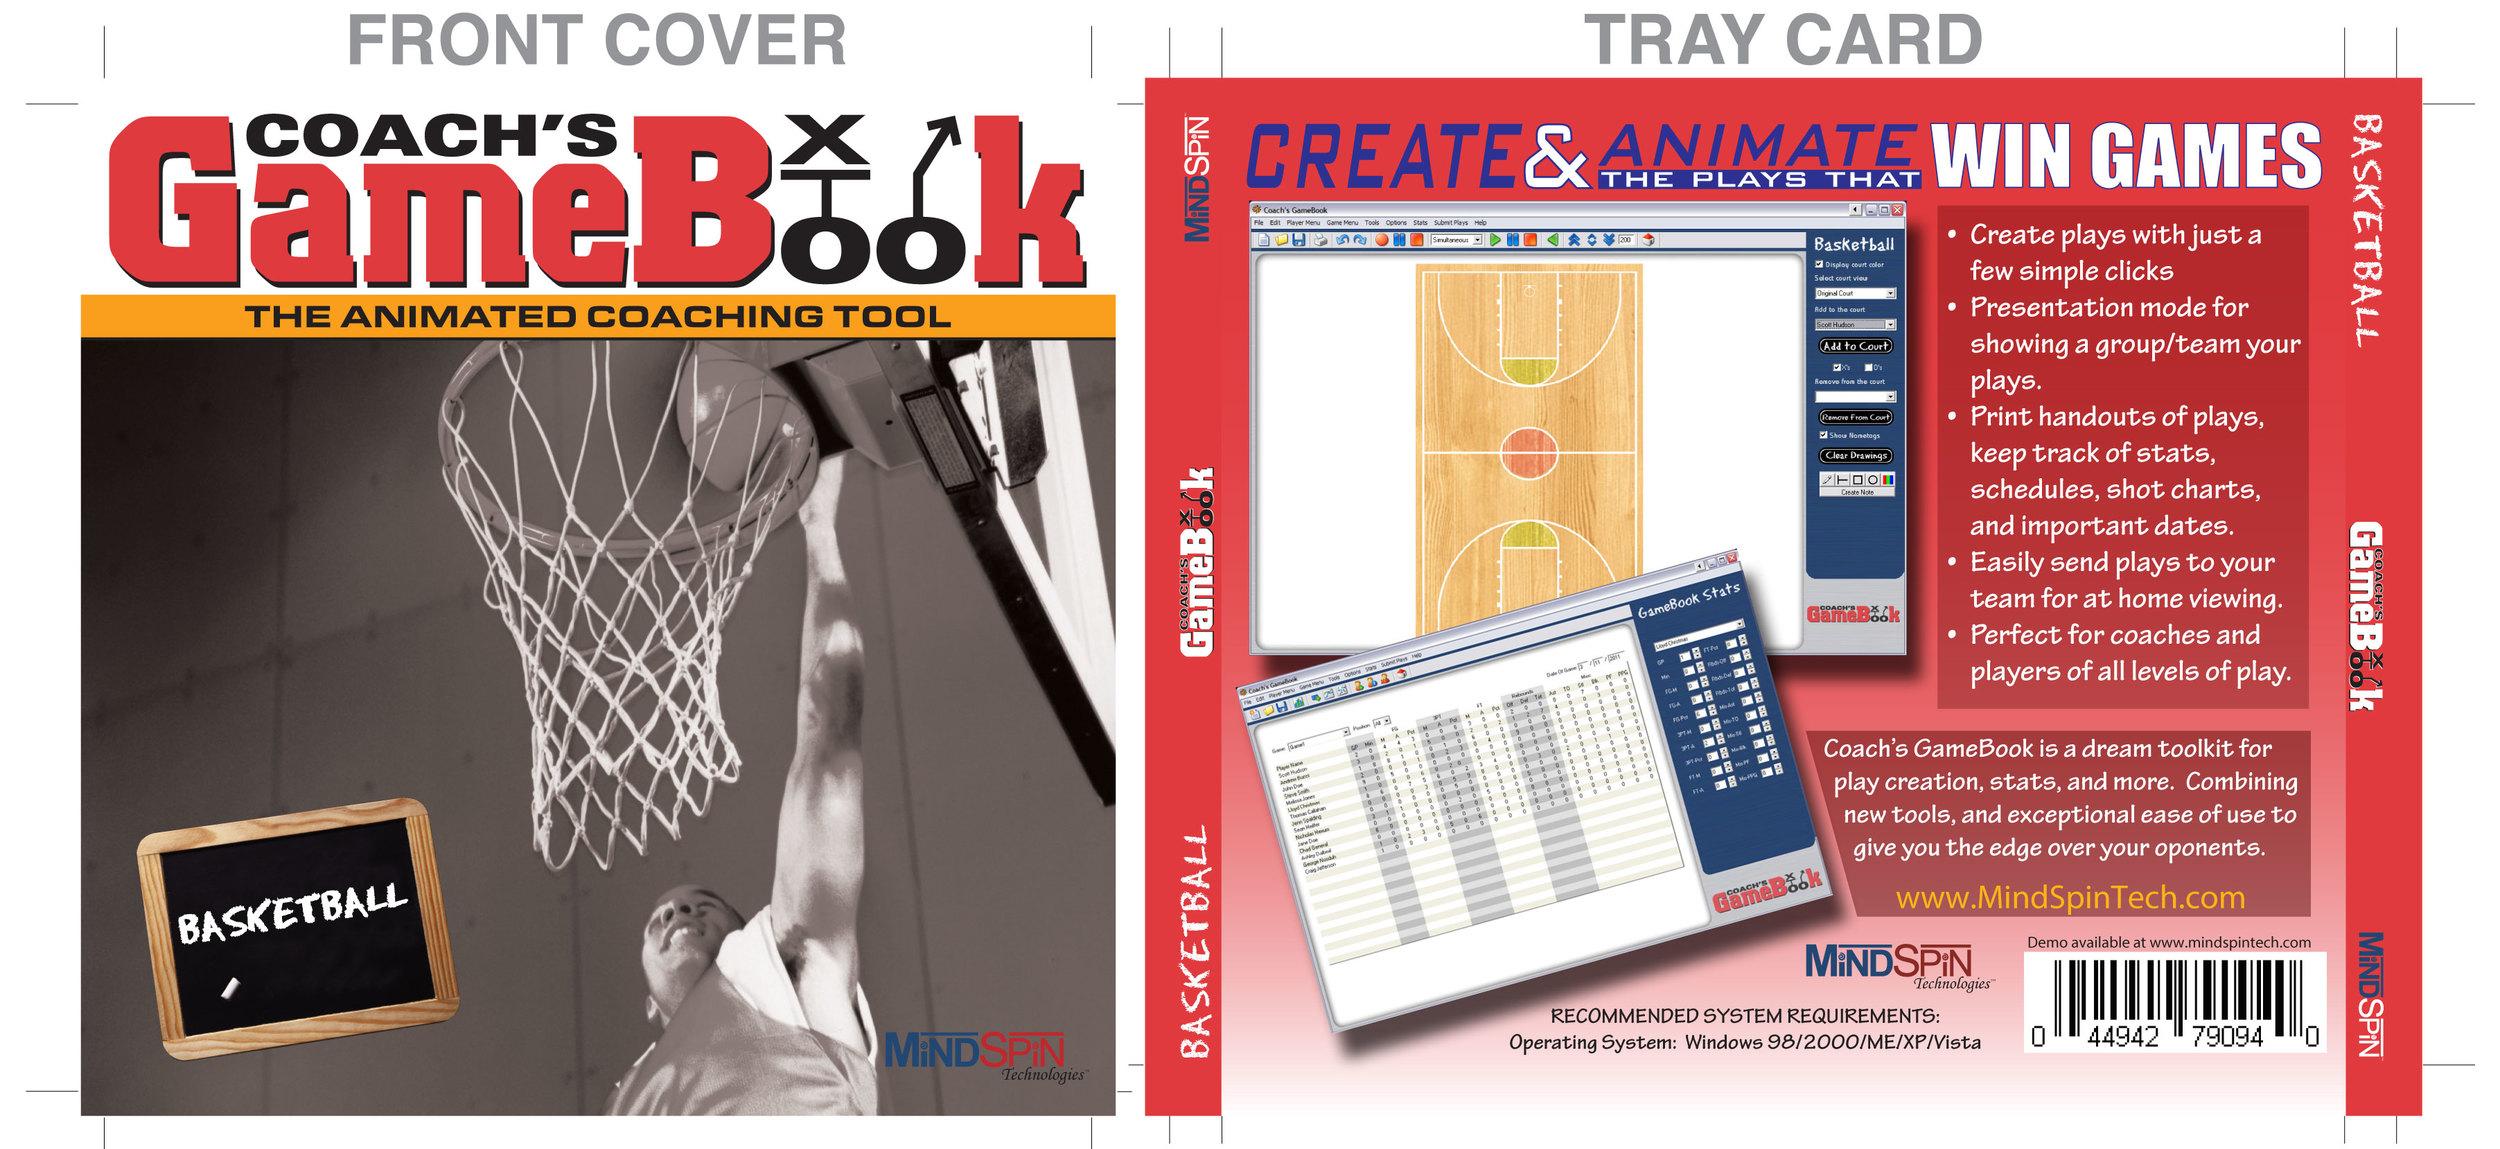 CGB_Jewel_Basketball-01.jpg